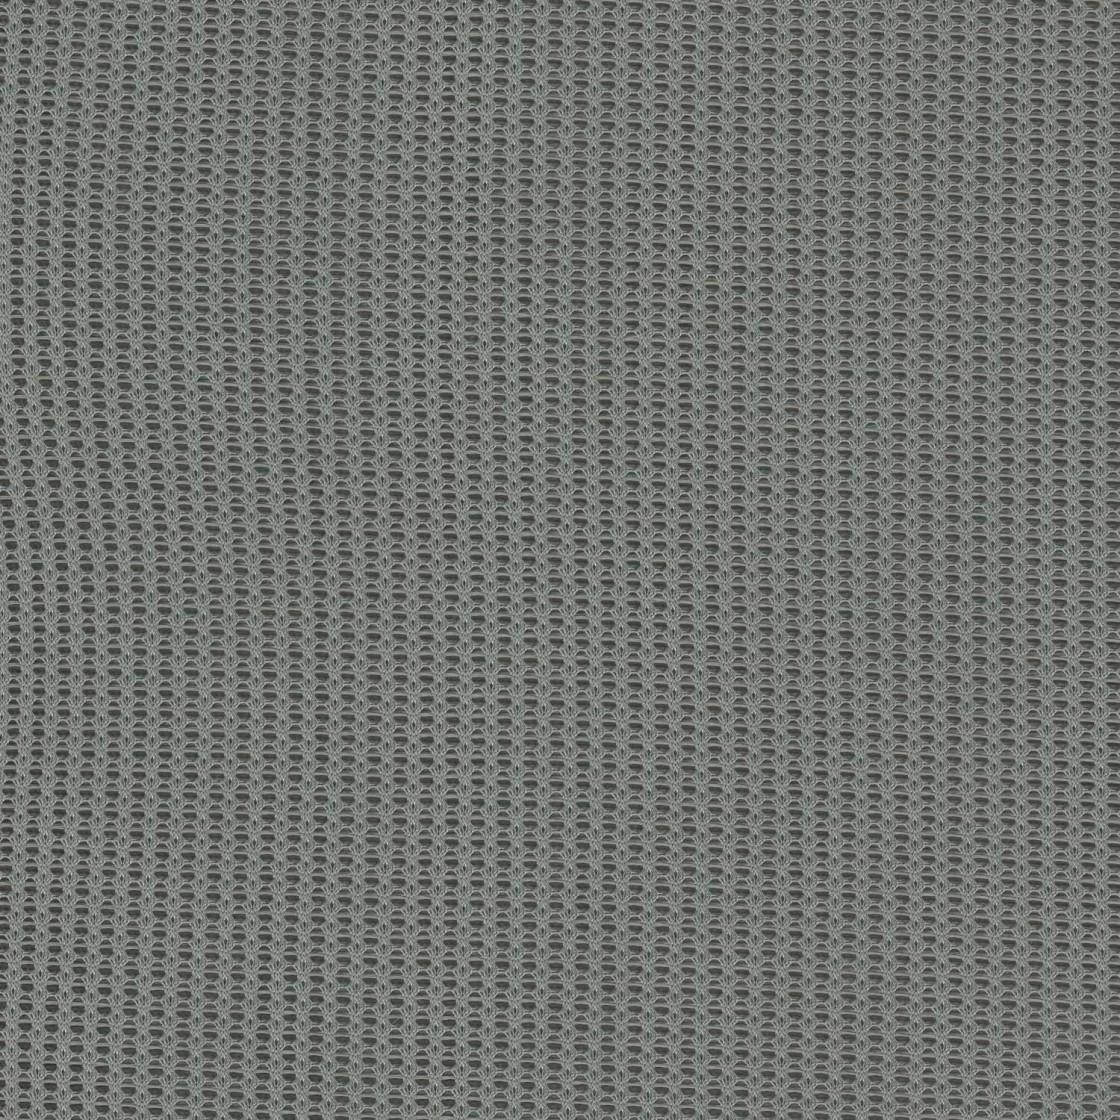 Microrun - Textile aéré, 6 coloris